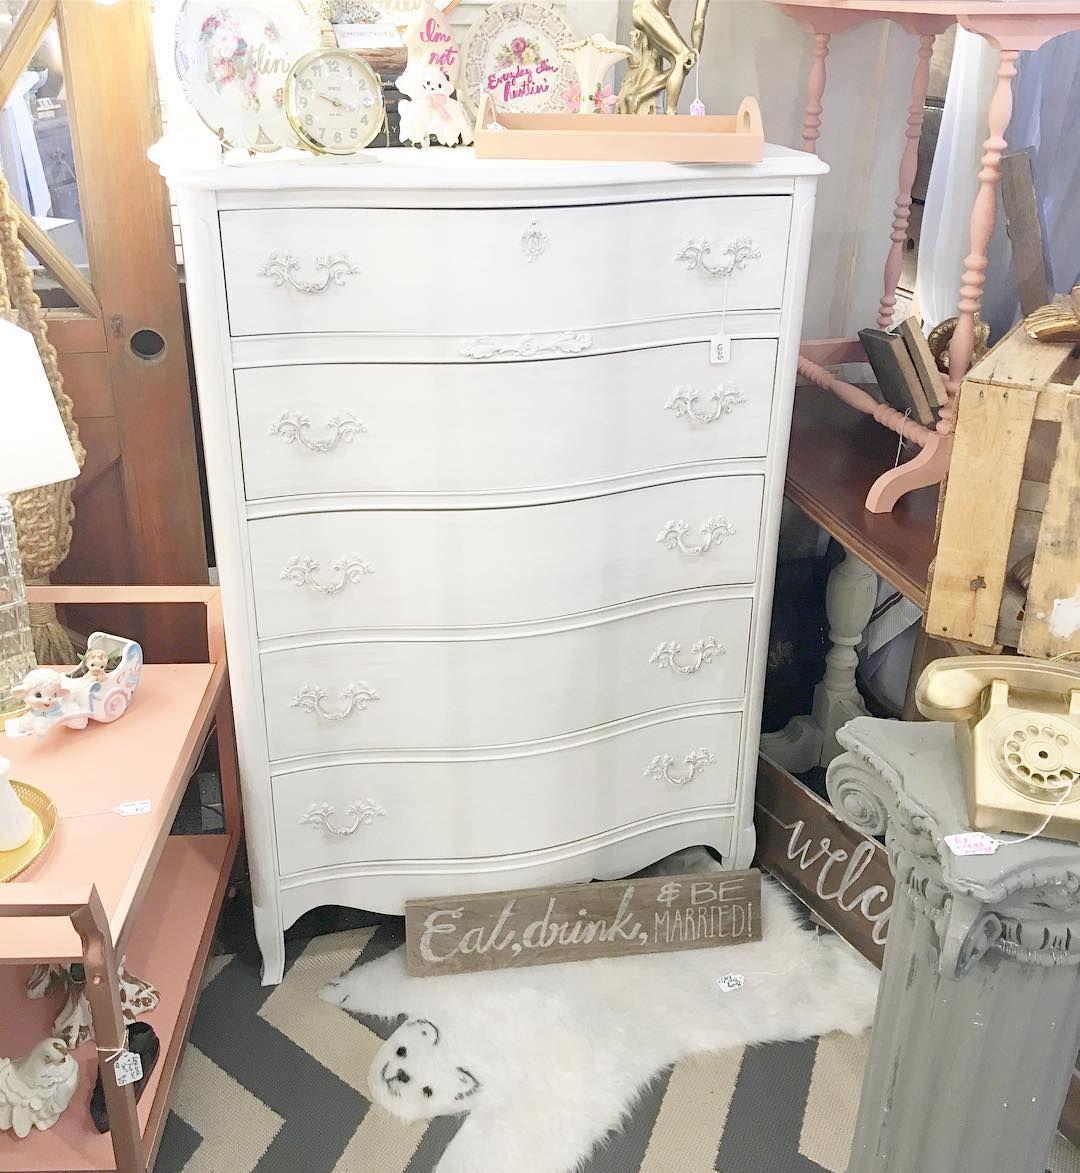 Sweet dresser display in my booth @curiositiesvintage